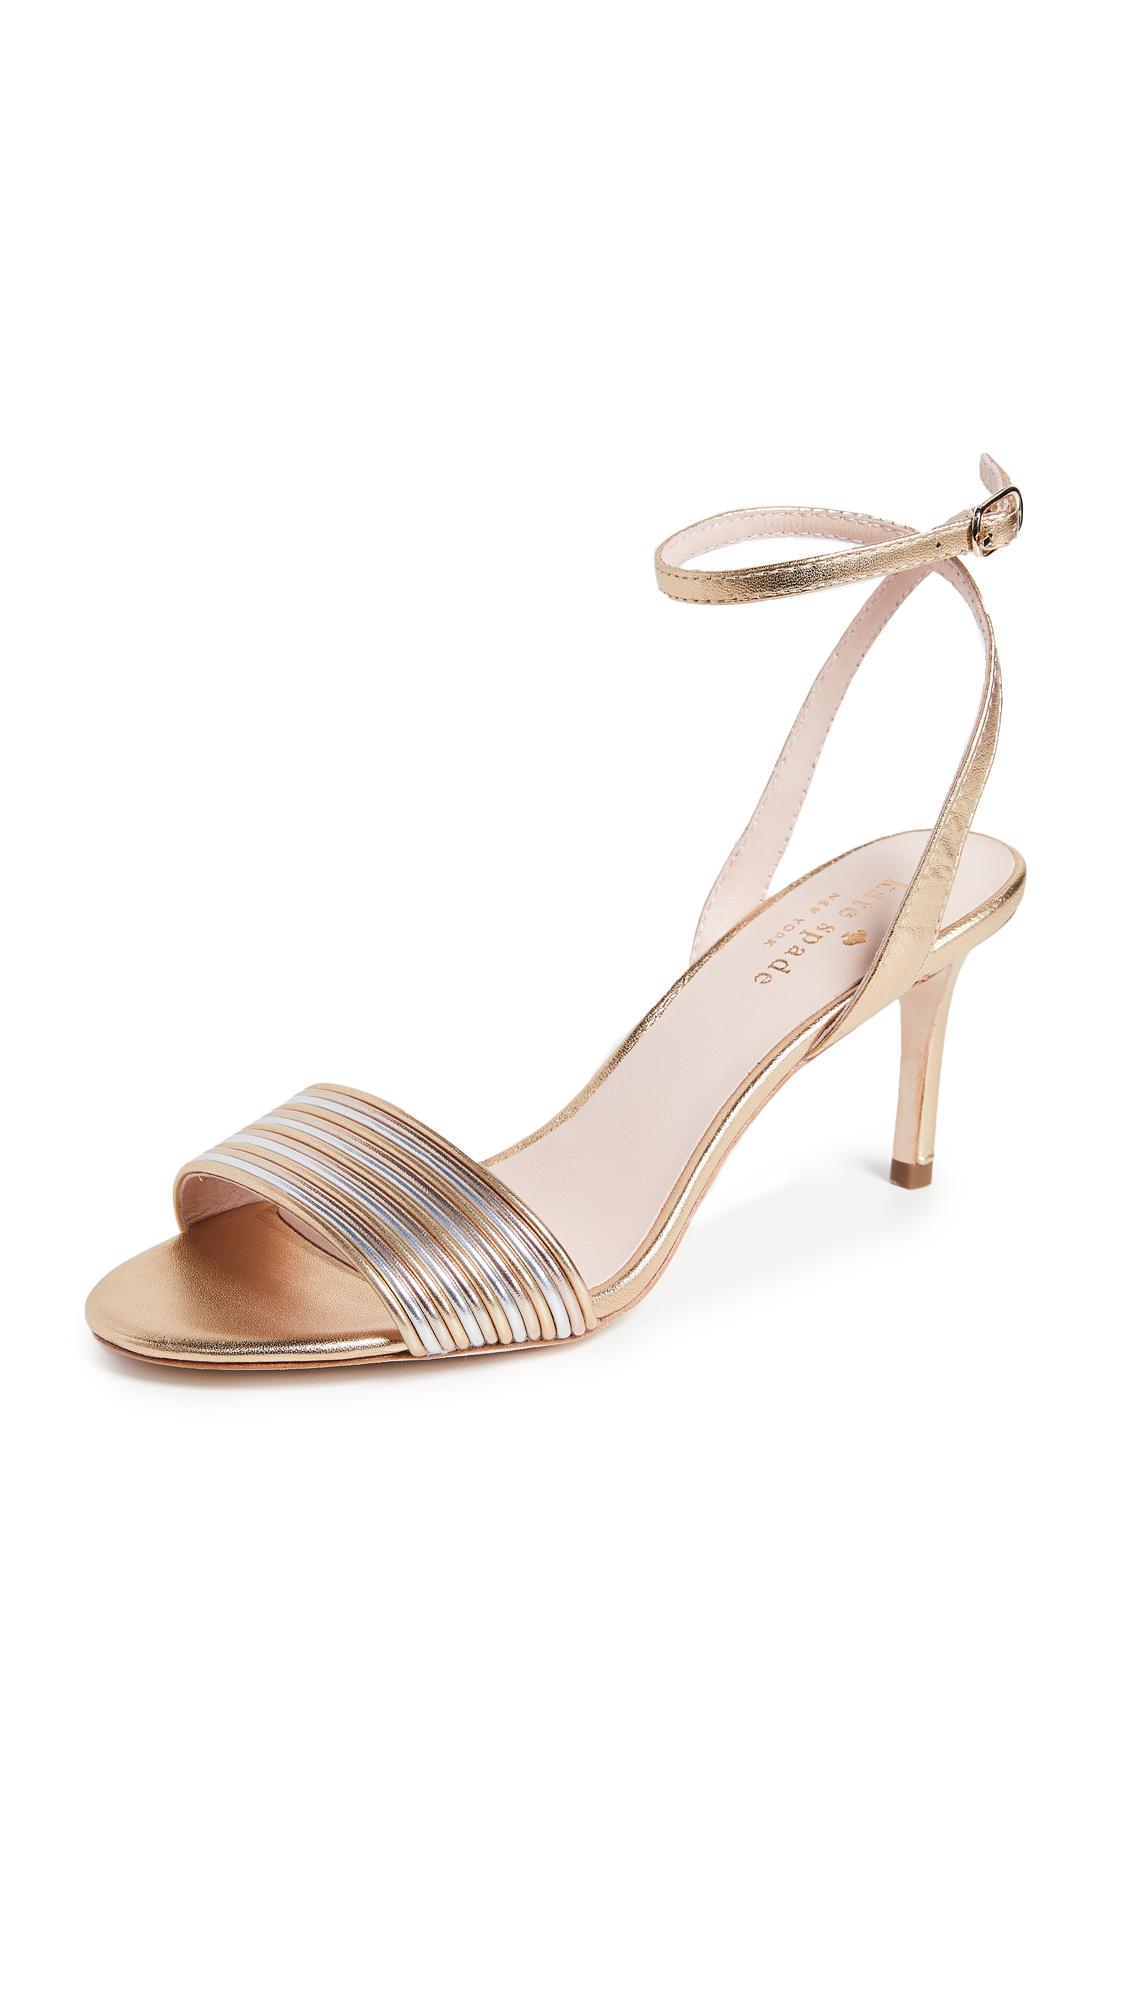 Kate Spade New York Jasmyne Kitten Heel Sandals - Multi